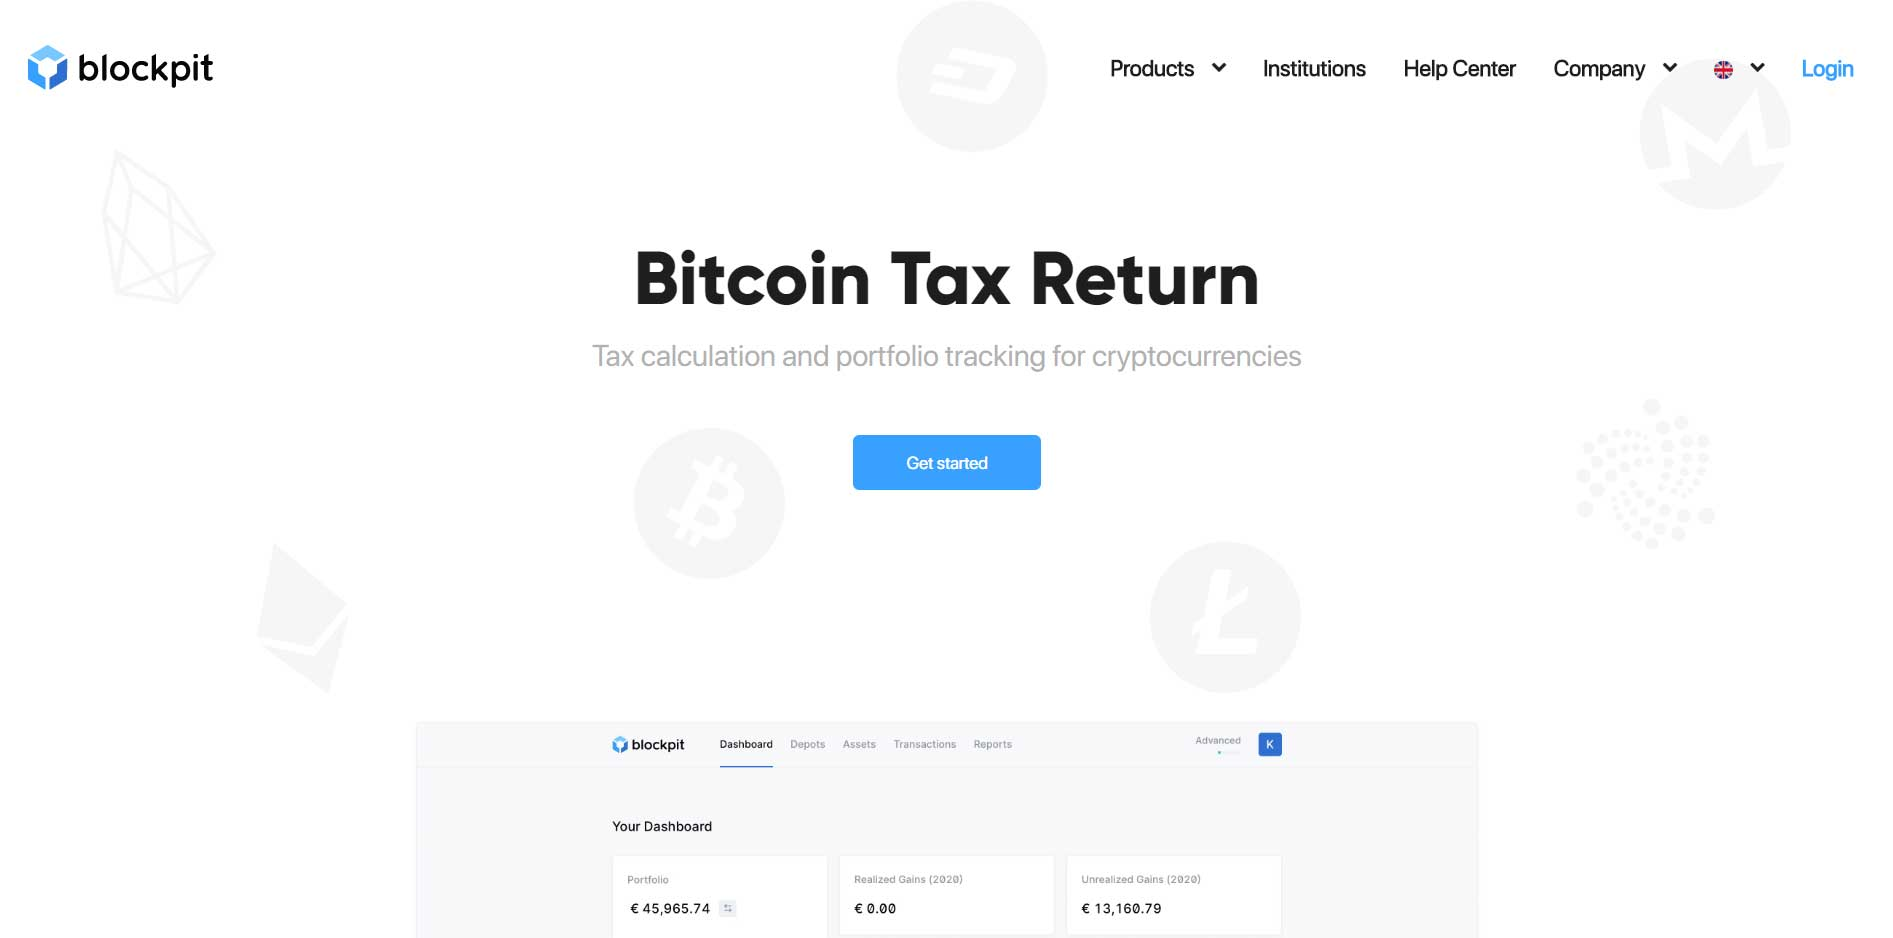 Blockpit is a bitcoin crypto tax software